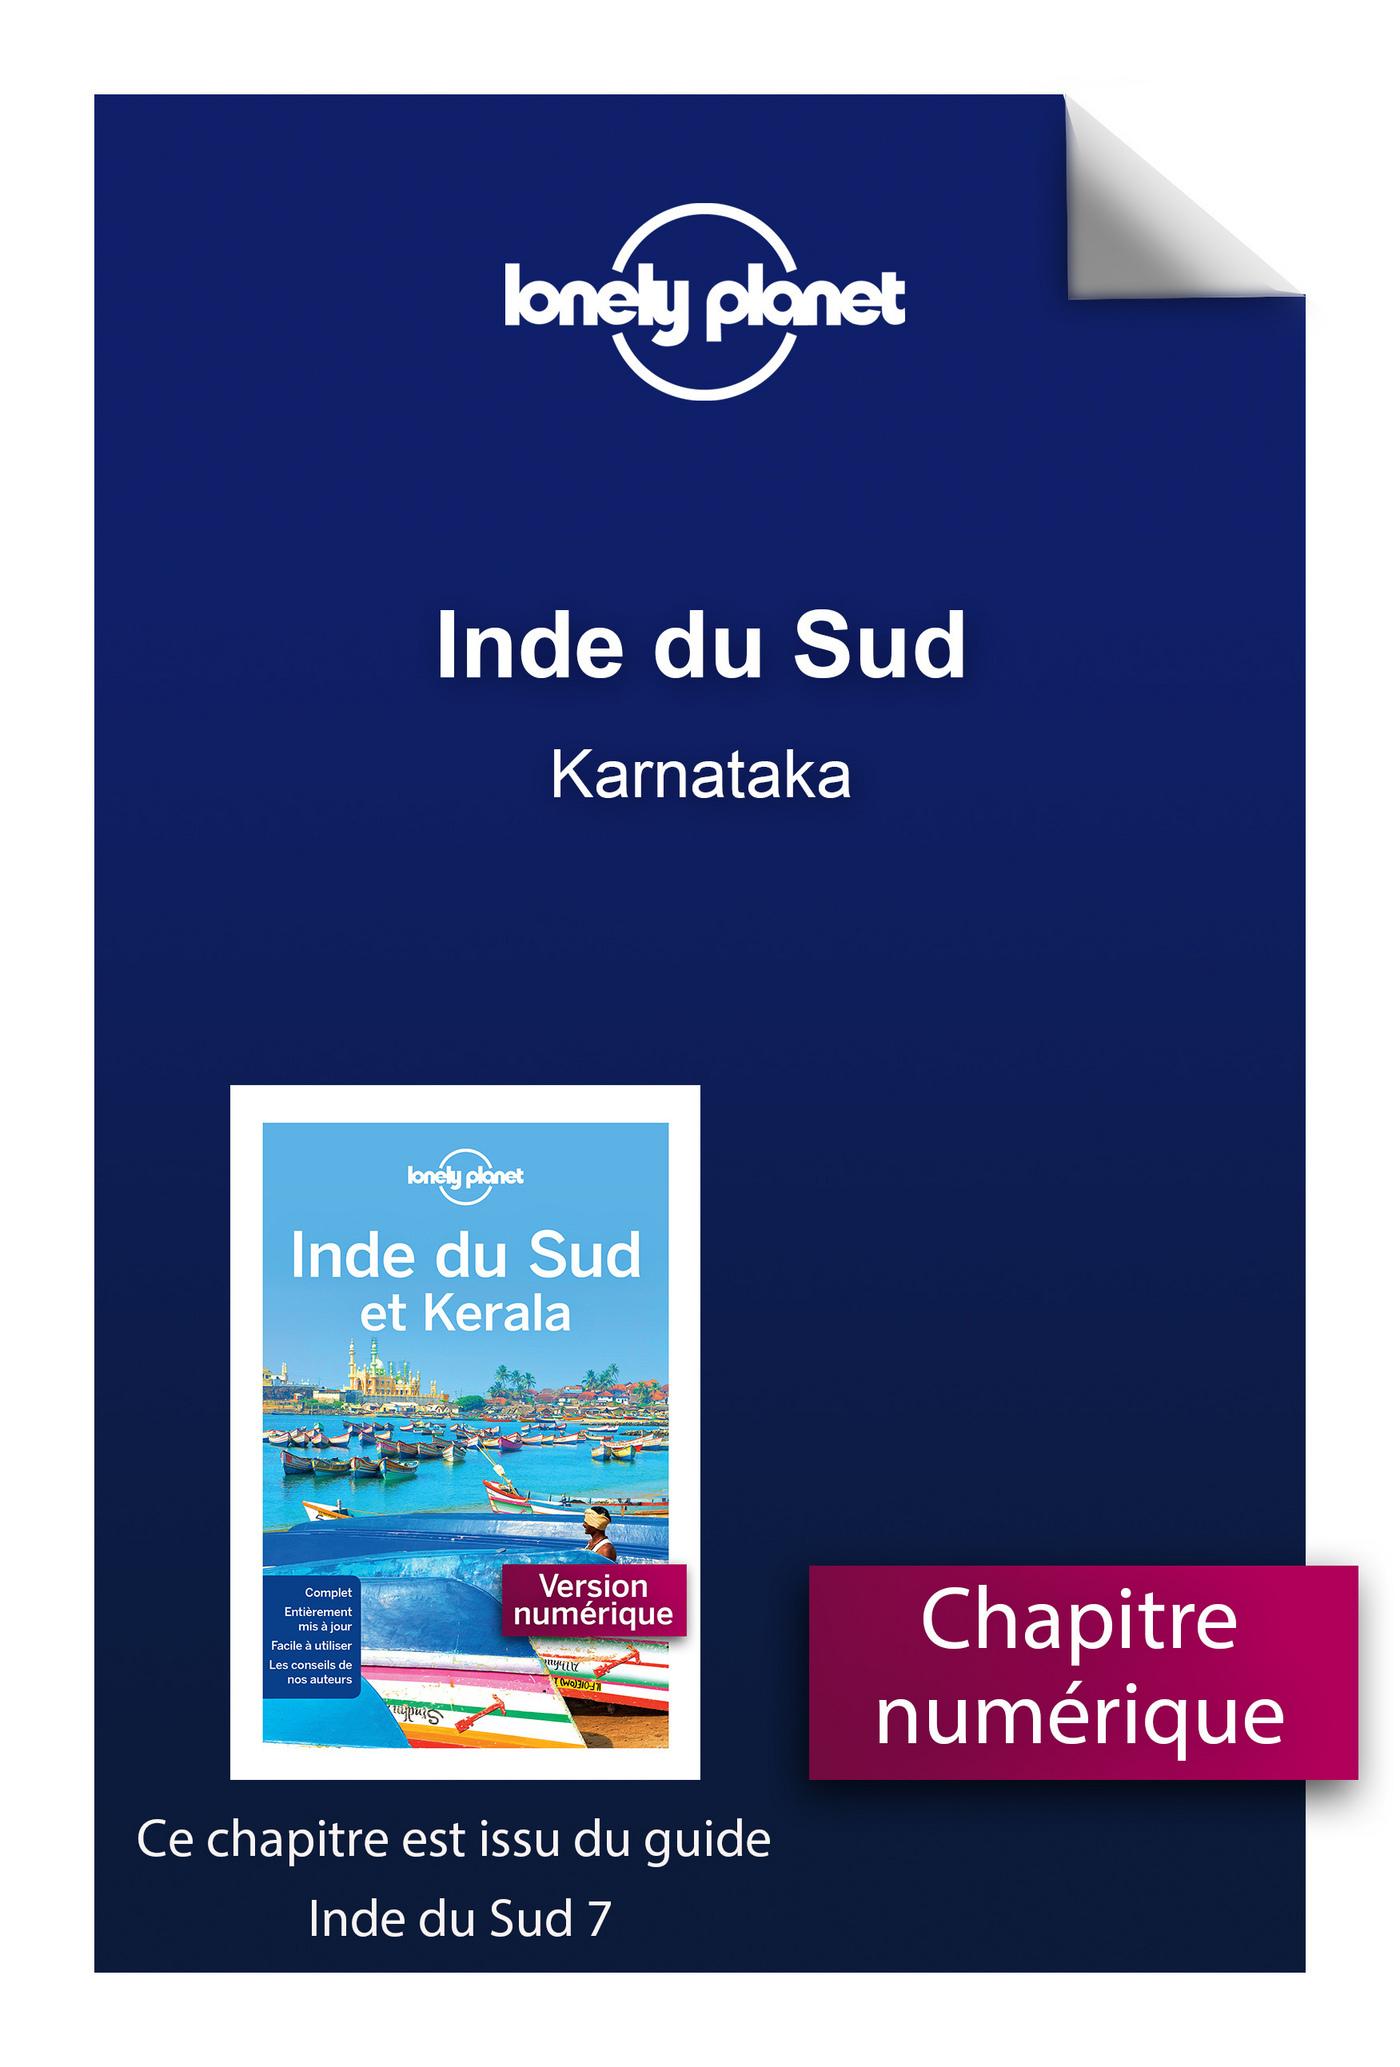 Inde du Sud - Karnataka et Bengaluru ( Bengalore)